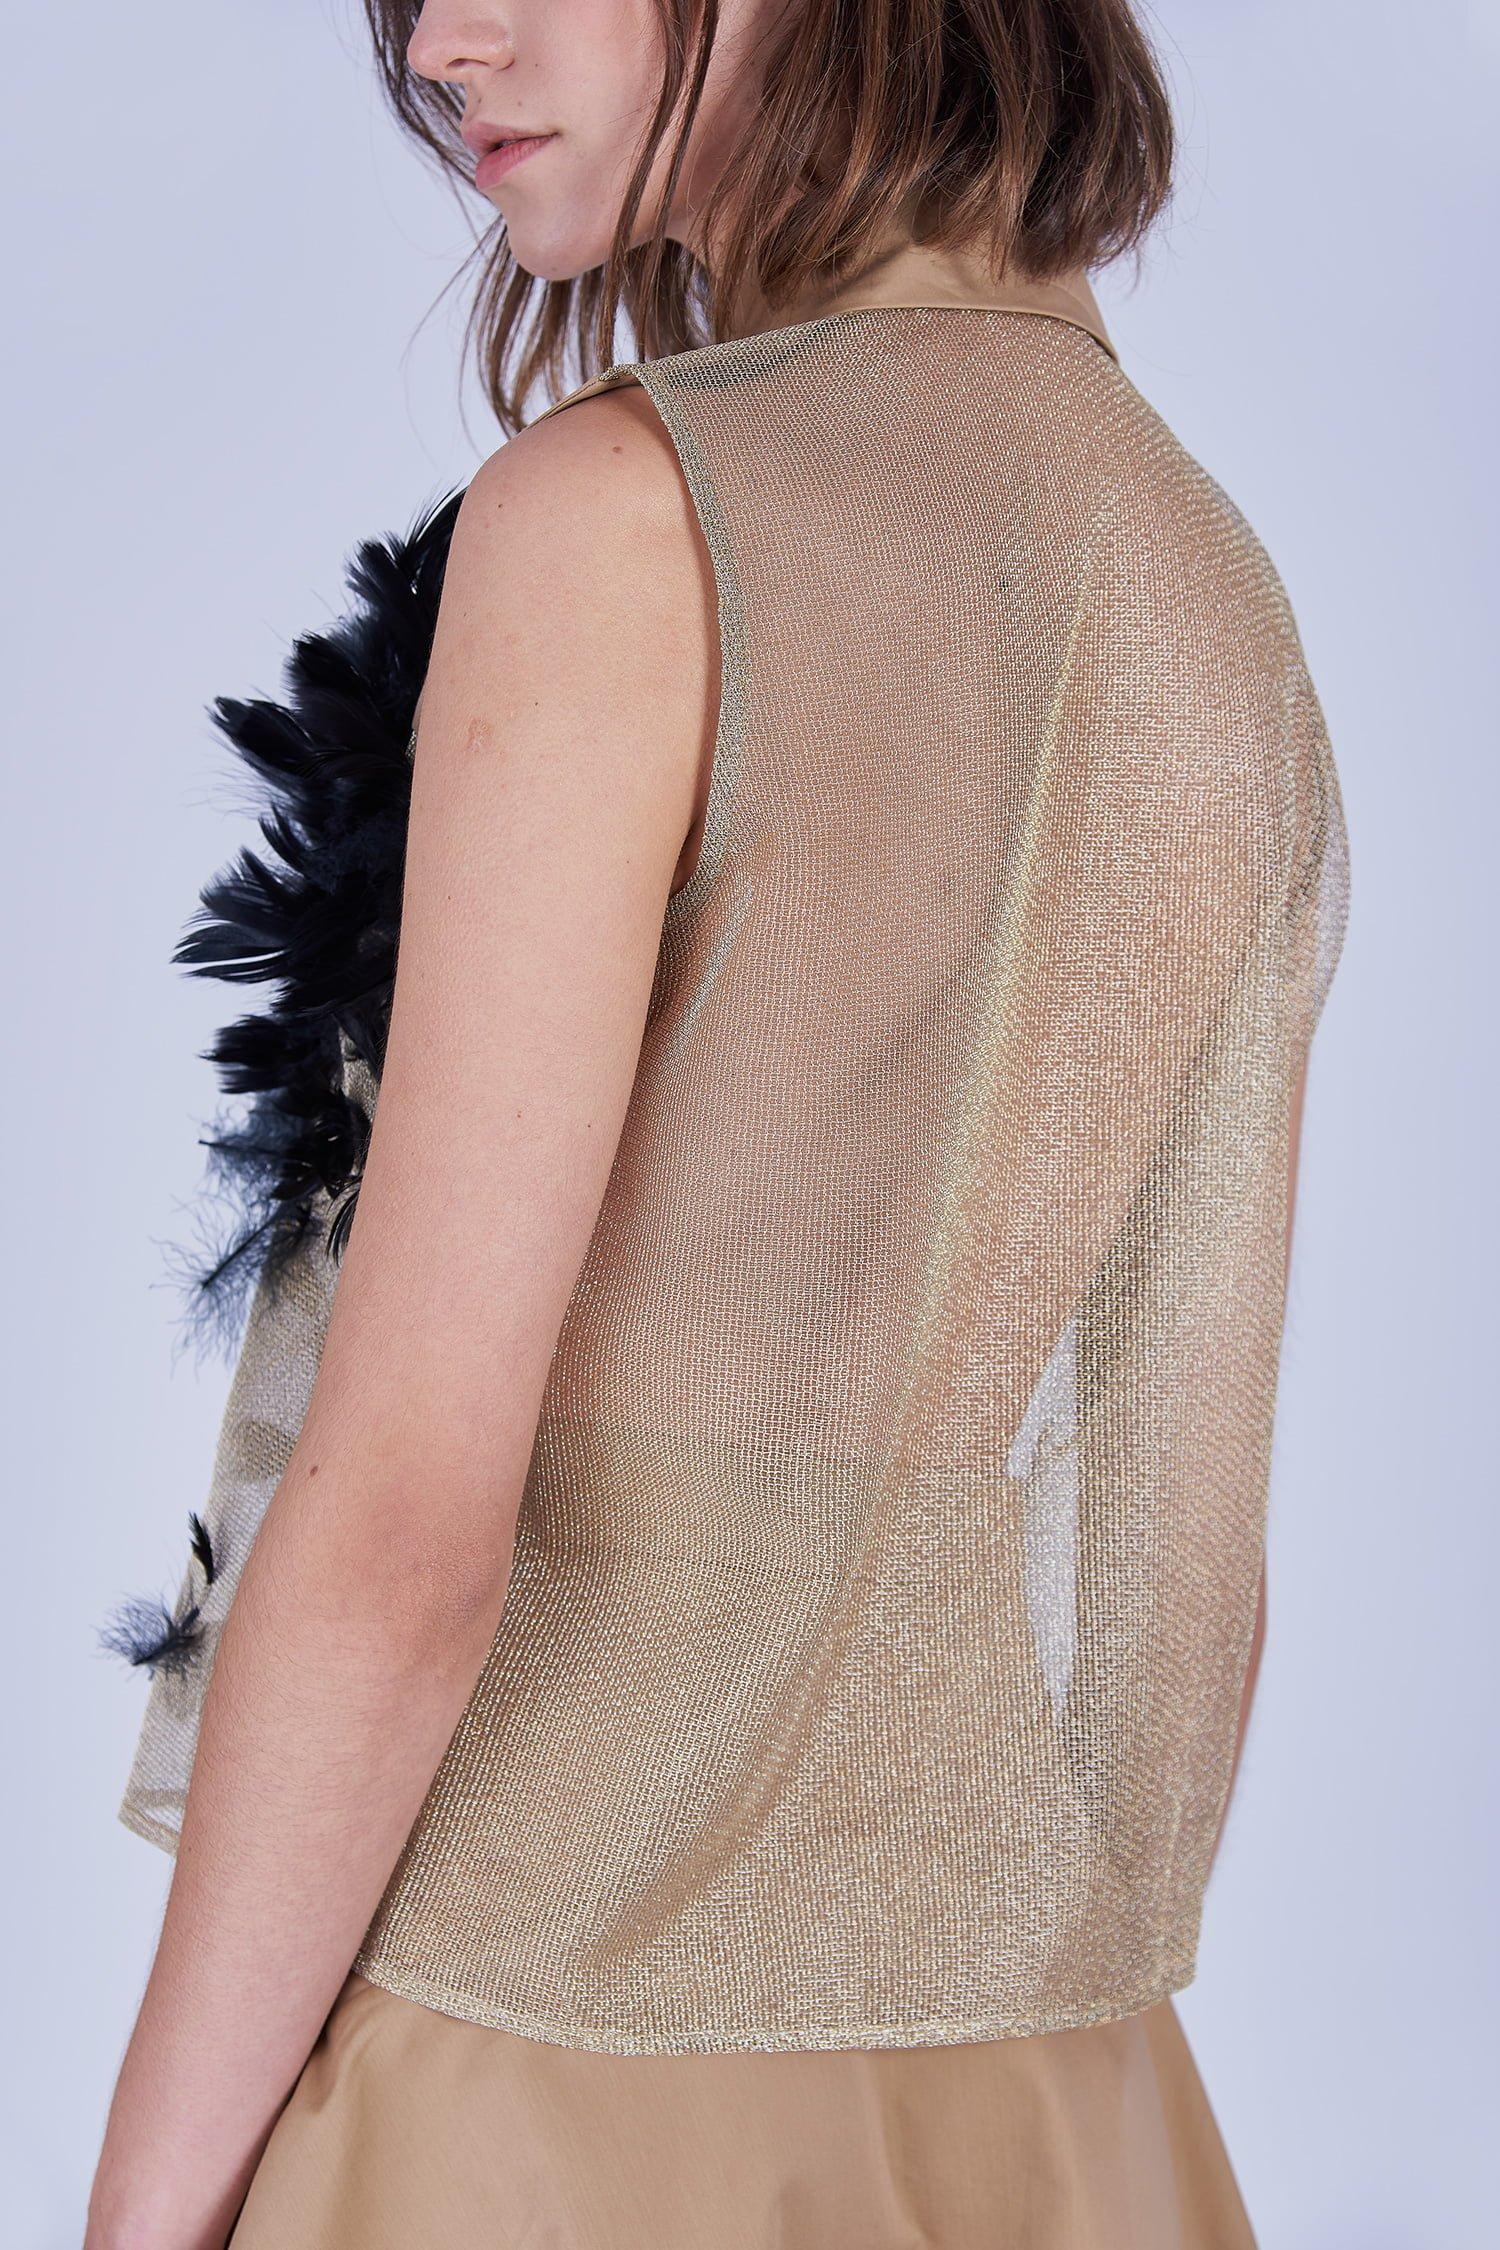 Acephala Ss2020 Beige Shirt Feathers Koszula Piorami Detail Back